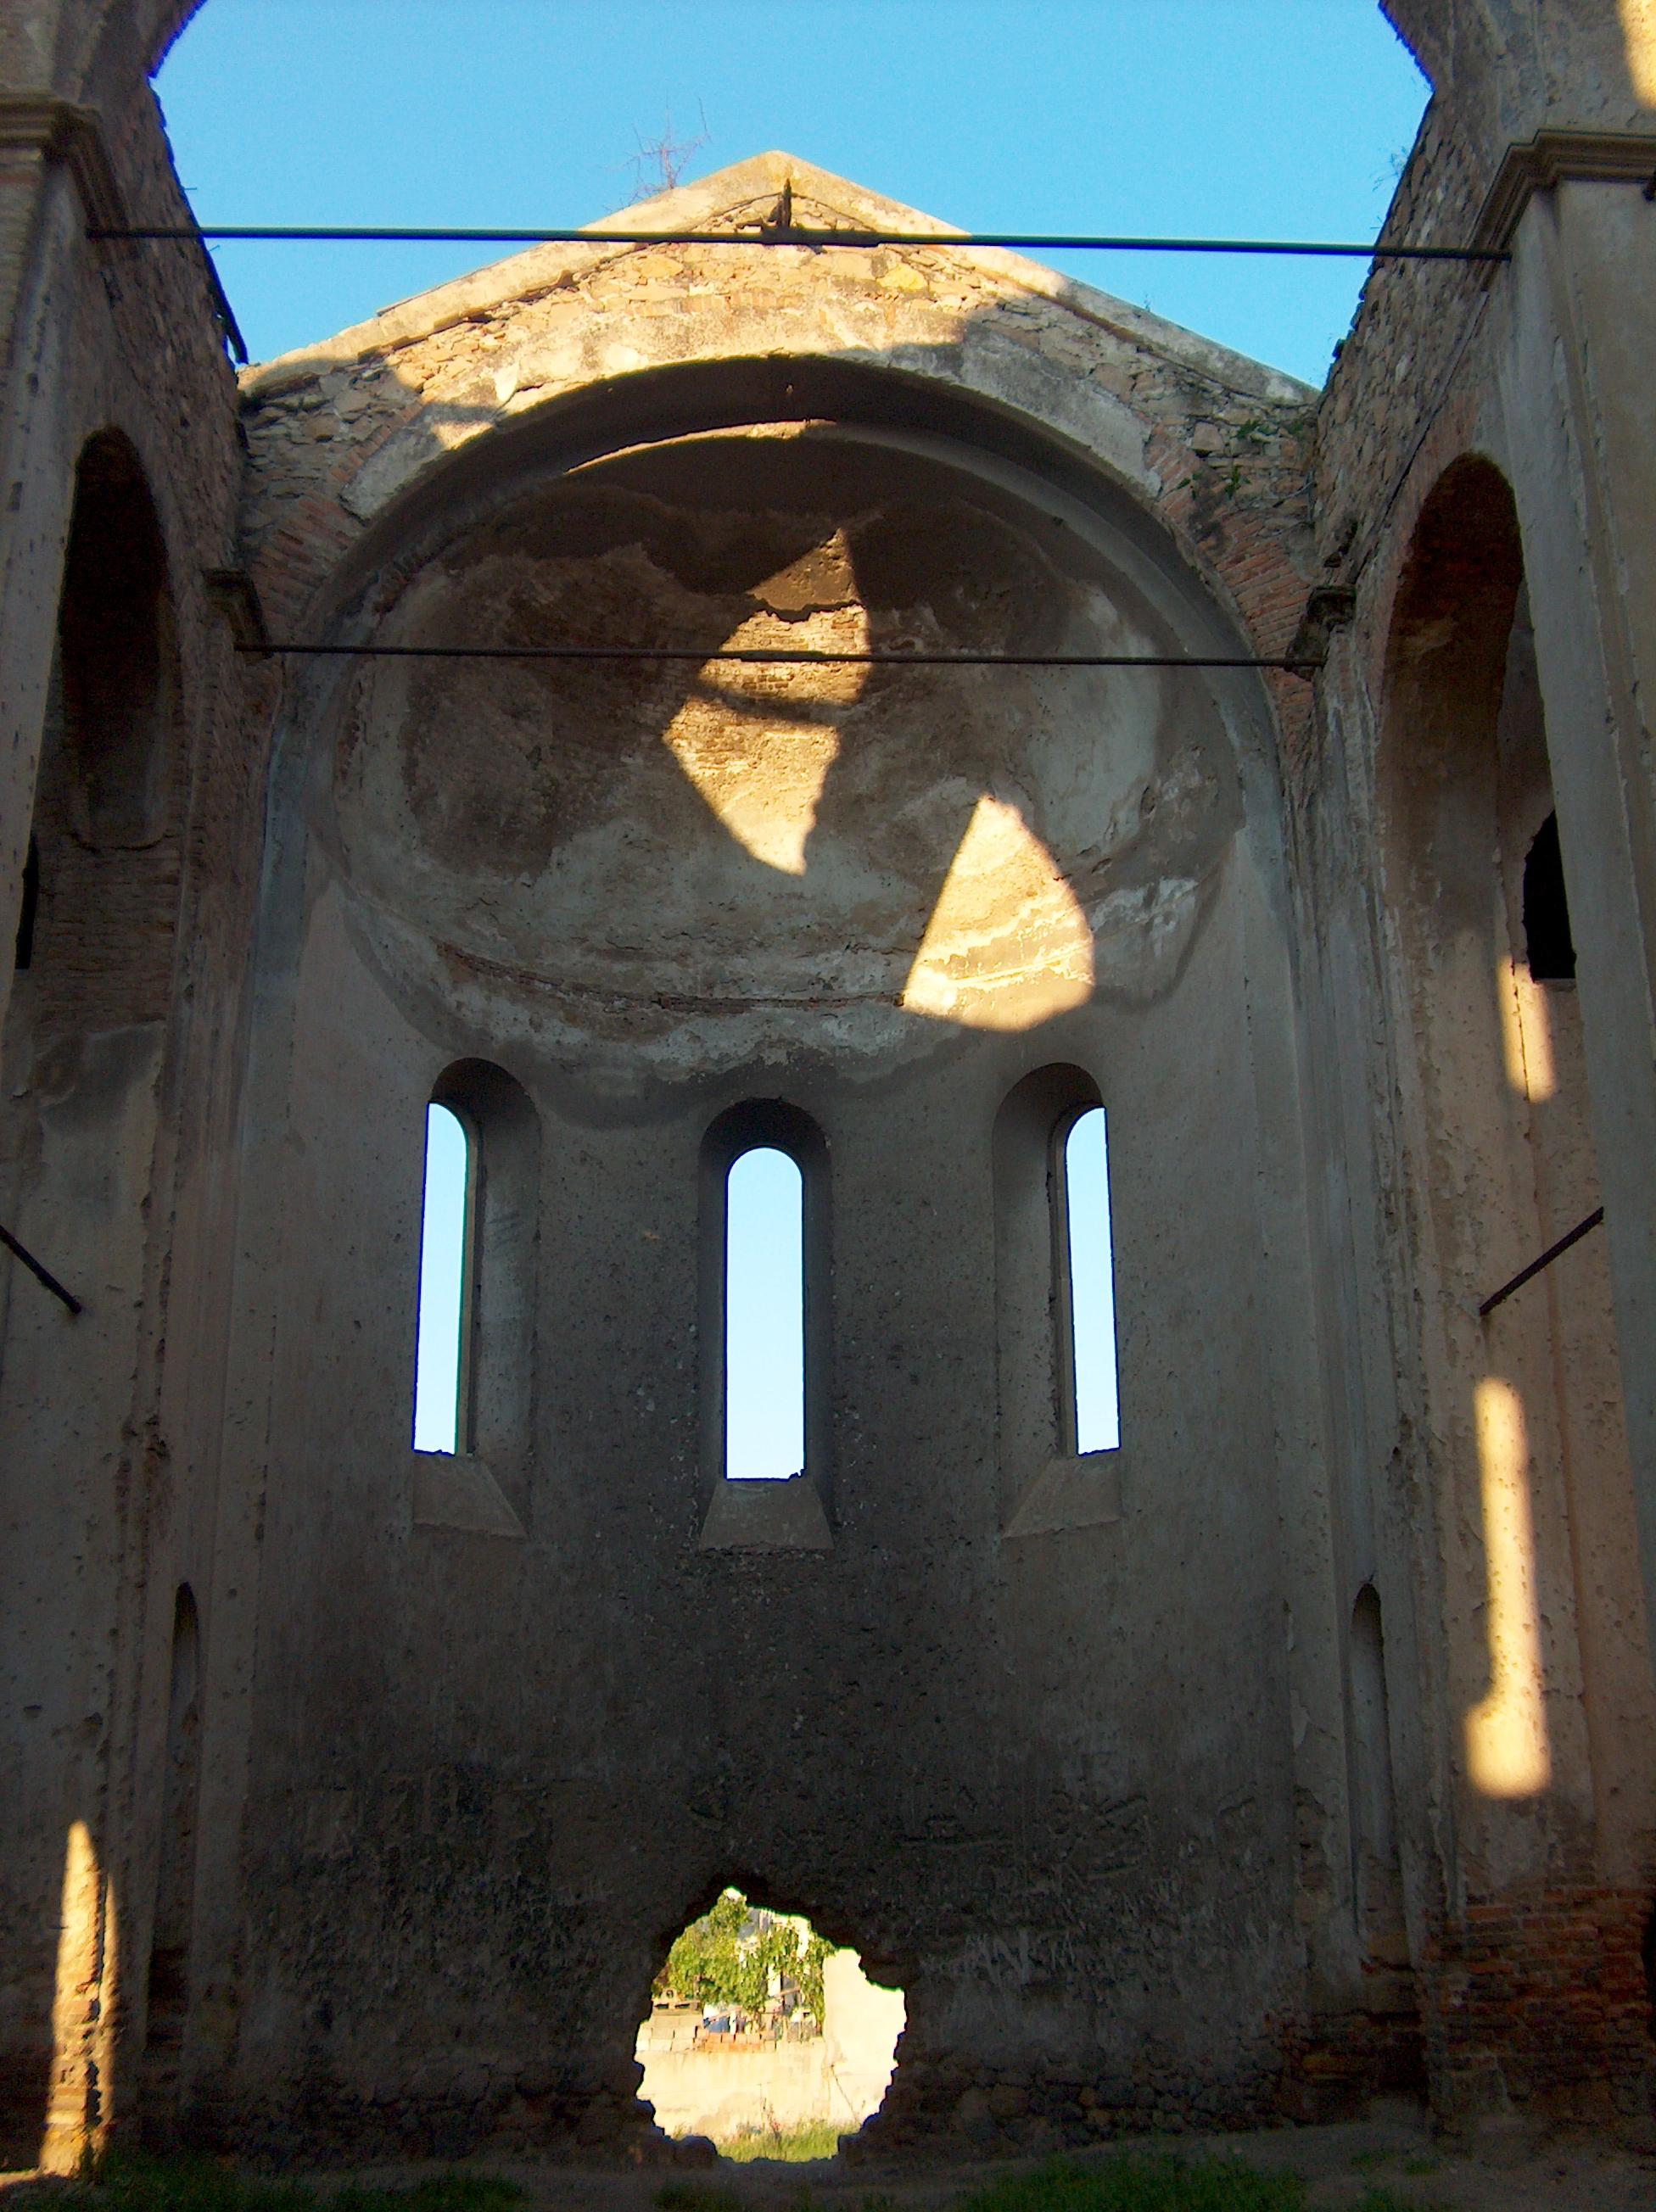 Fotoğraf 61. Hagios Georgios (Aya Yorgi) Rum Kilisesi absid bölümü.